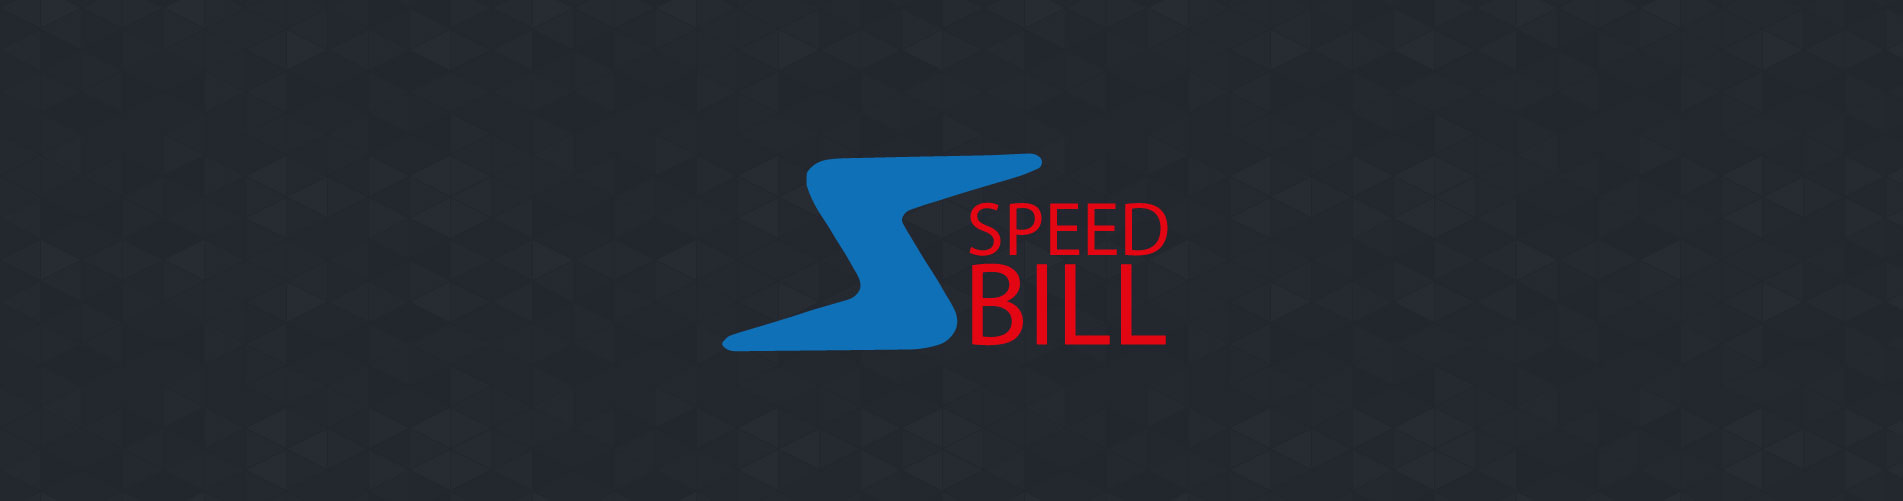 Kostenloses Online Rechnungsprogramm Speed Bill Edv Melhorn